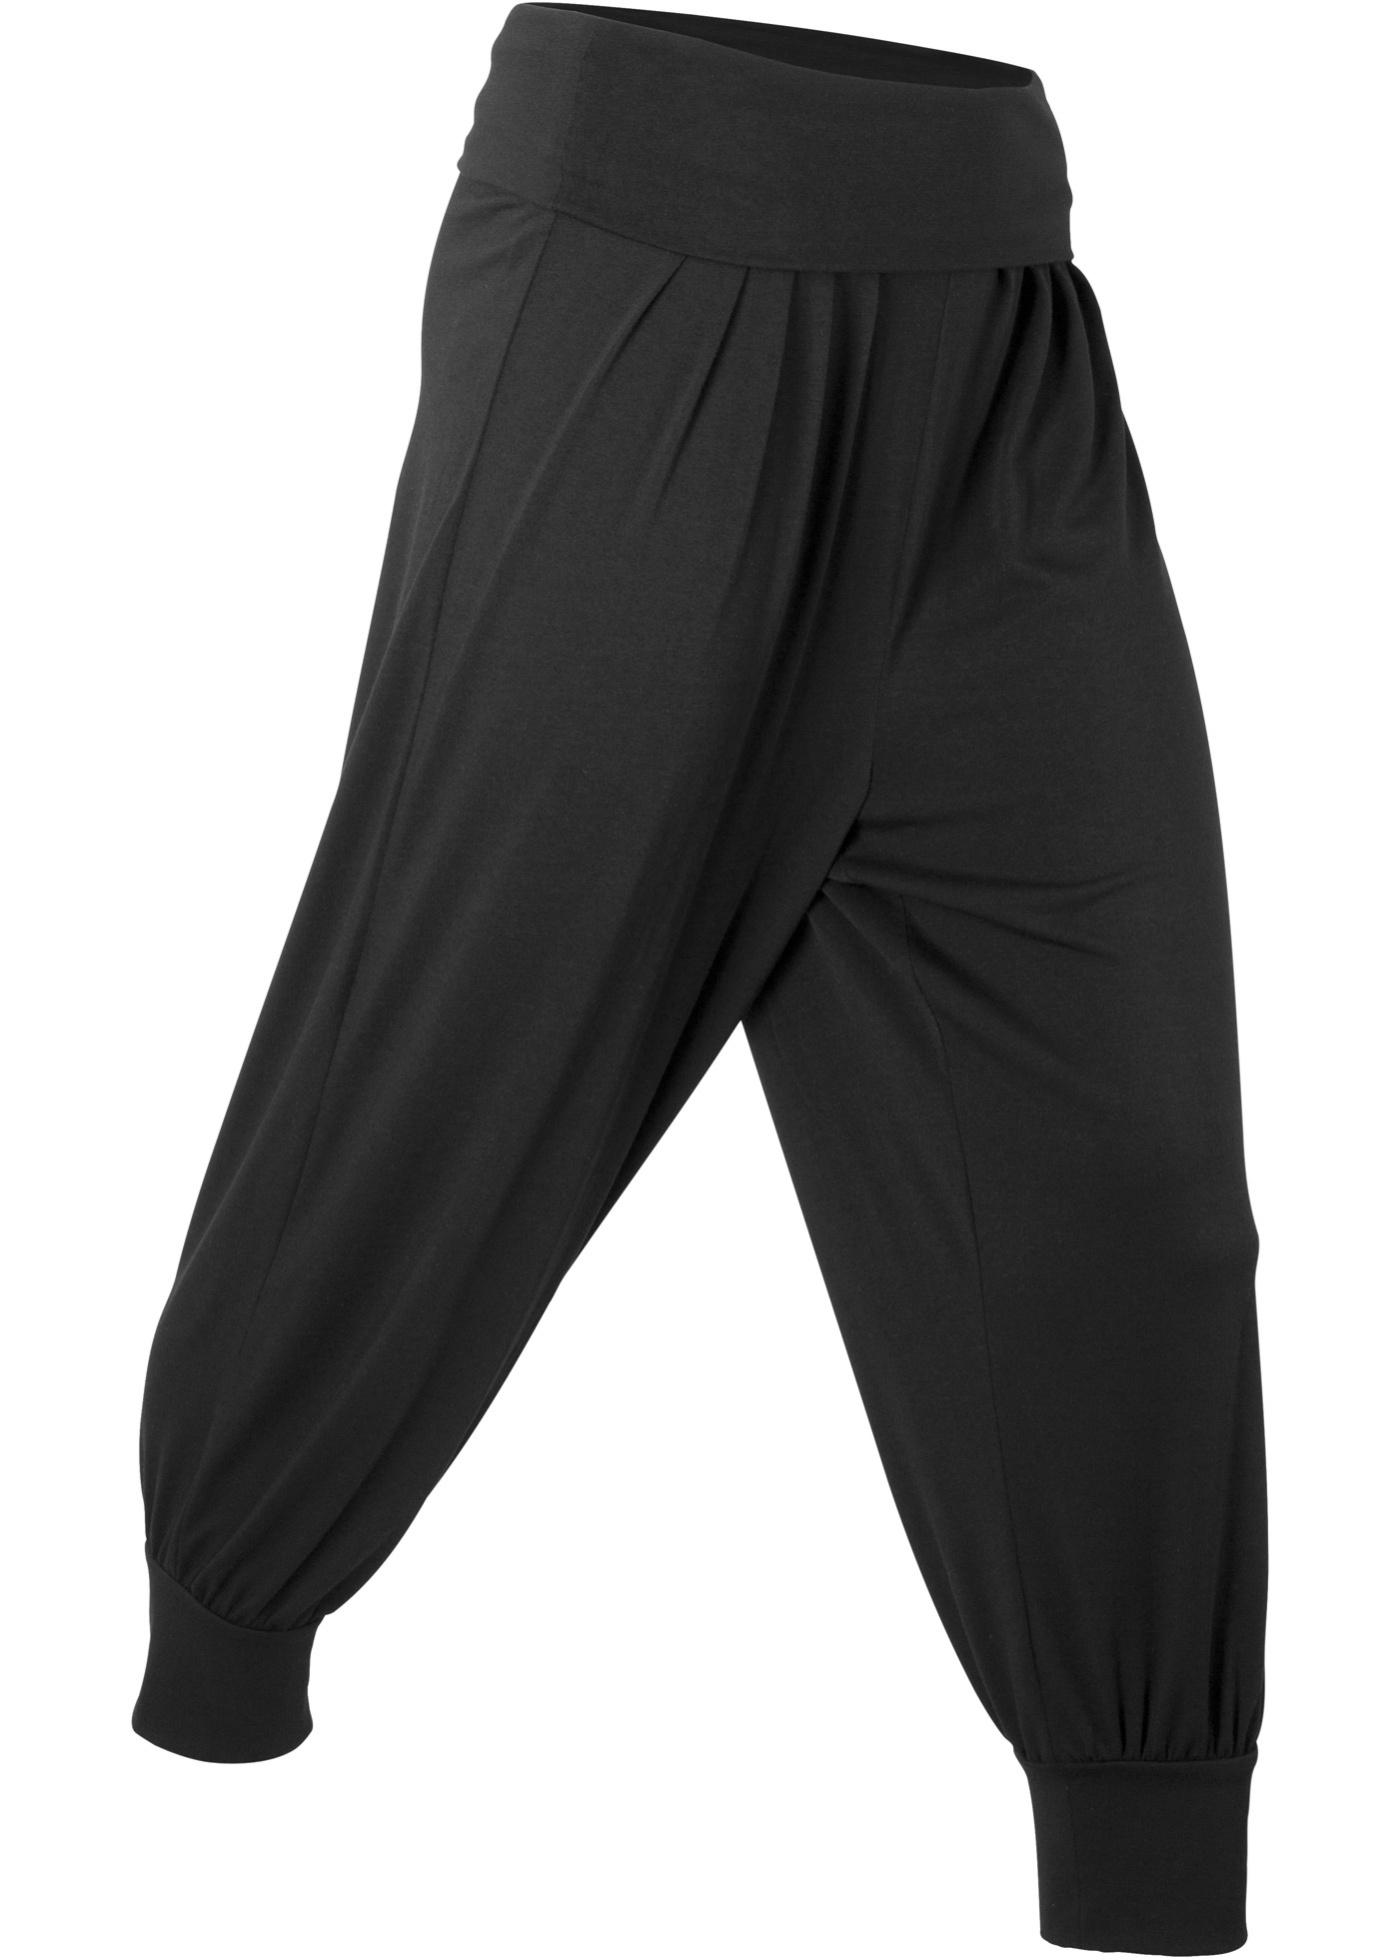 fafa47aeaa8 Haremove kalhoty divci 3 4 levně